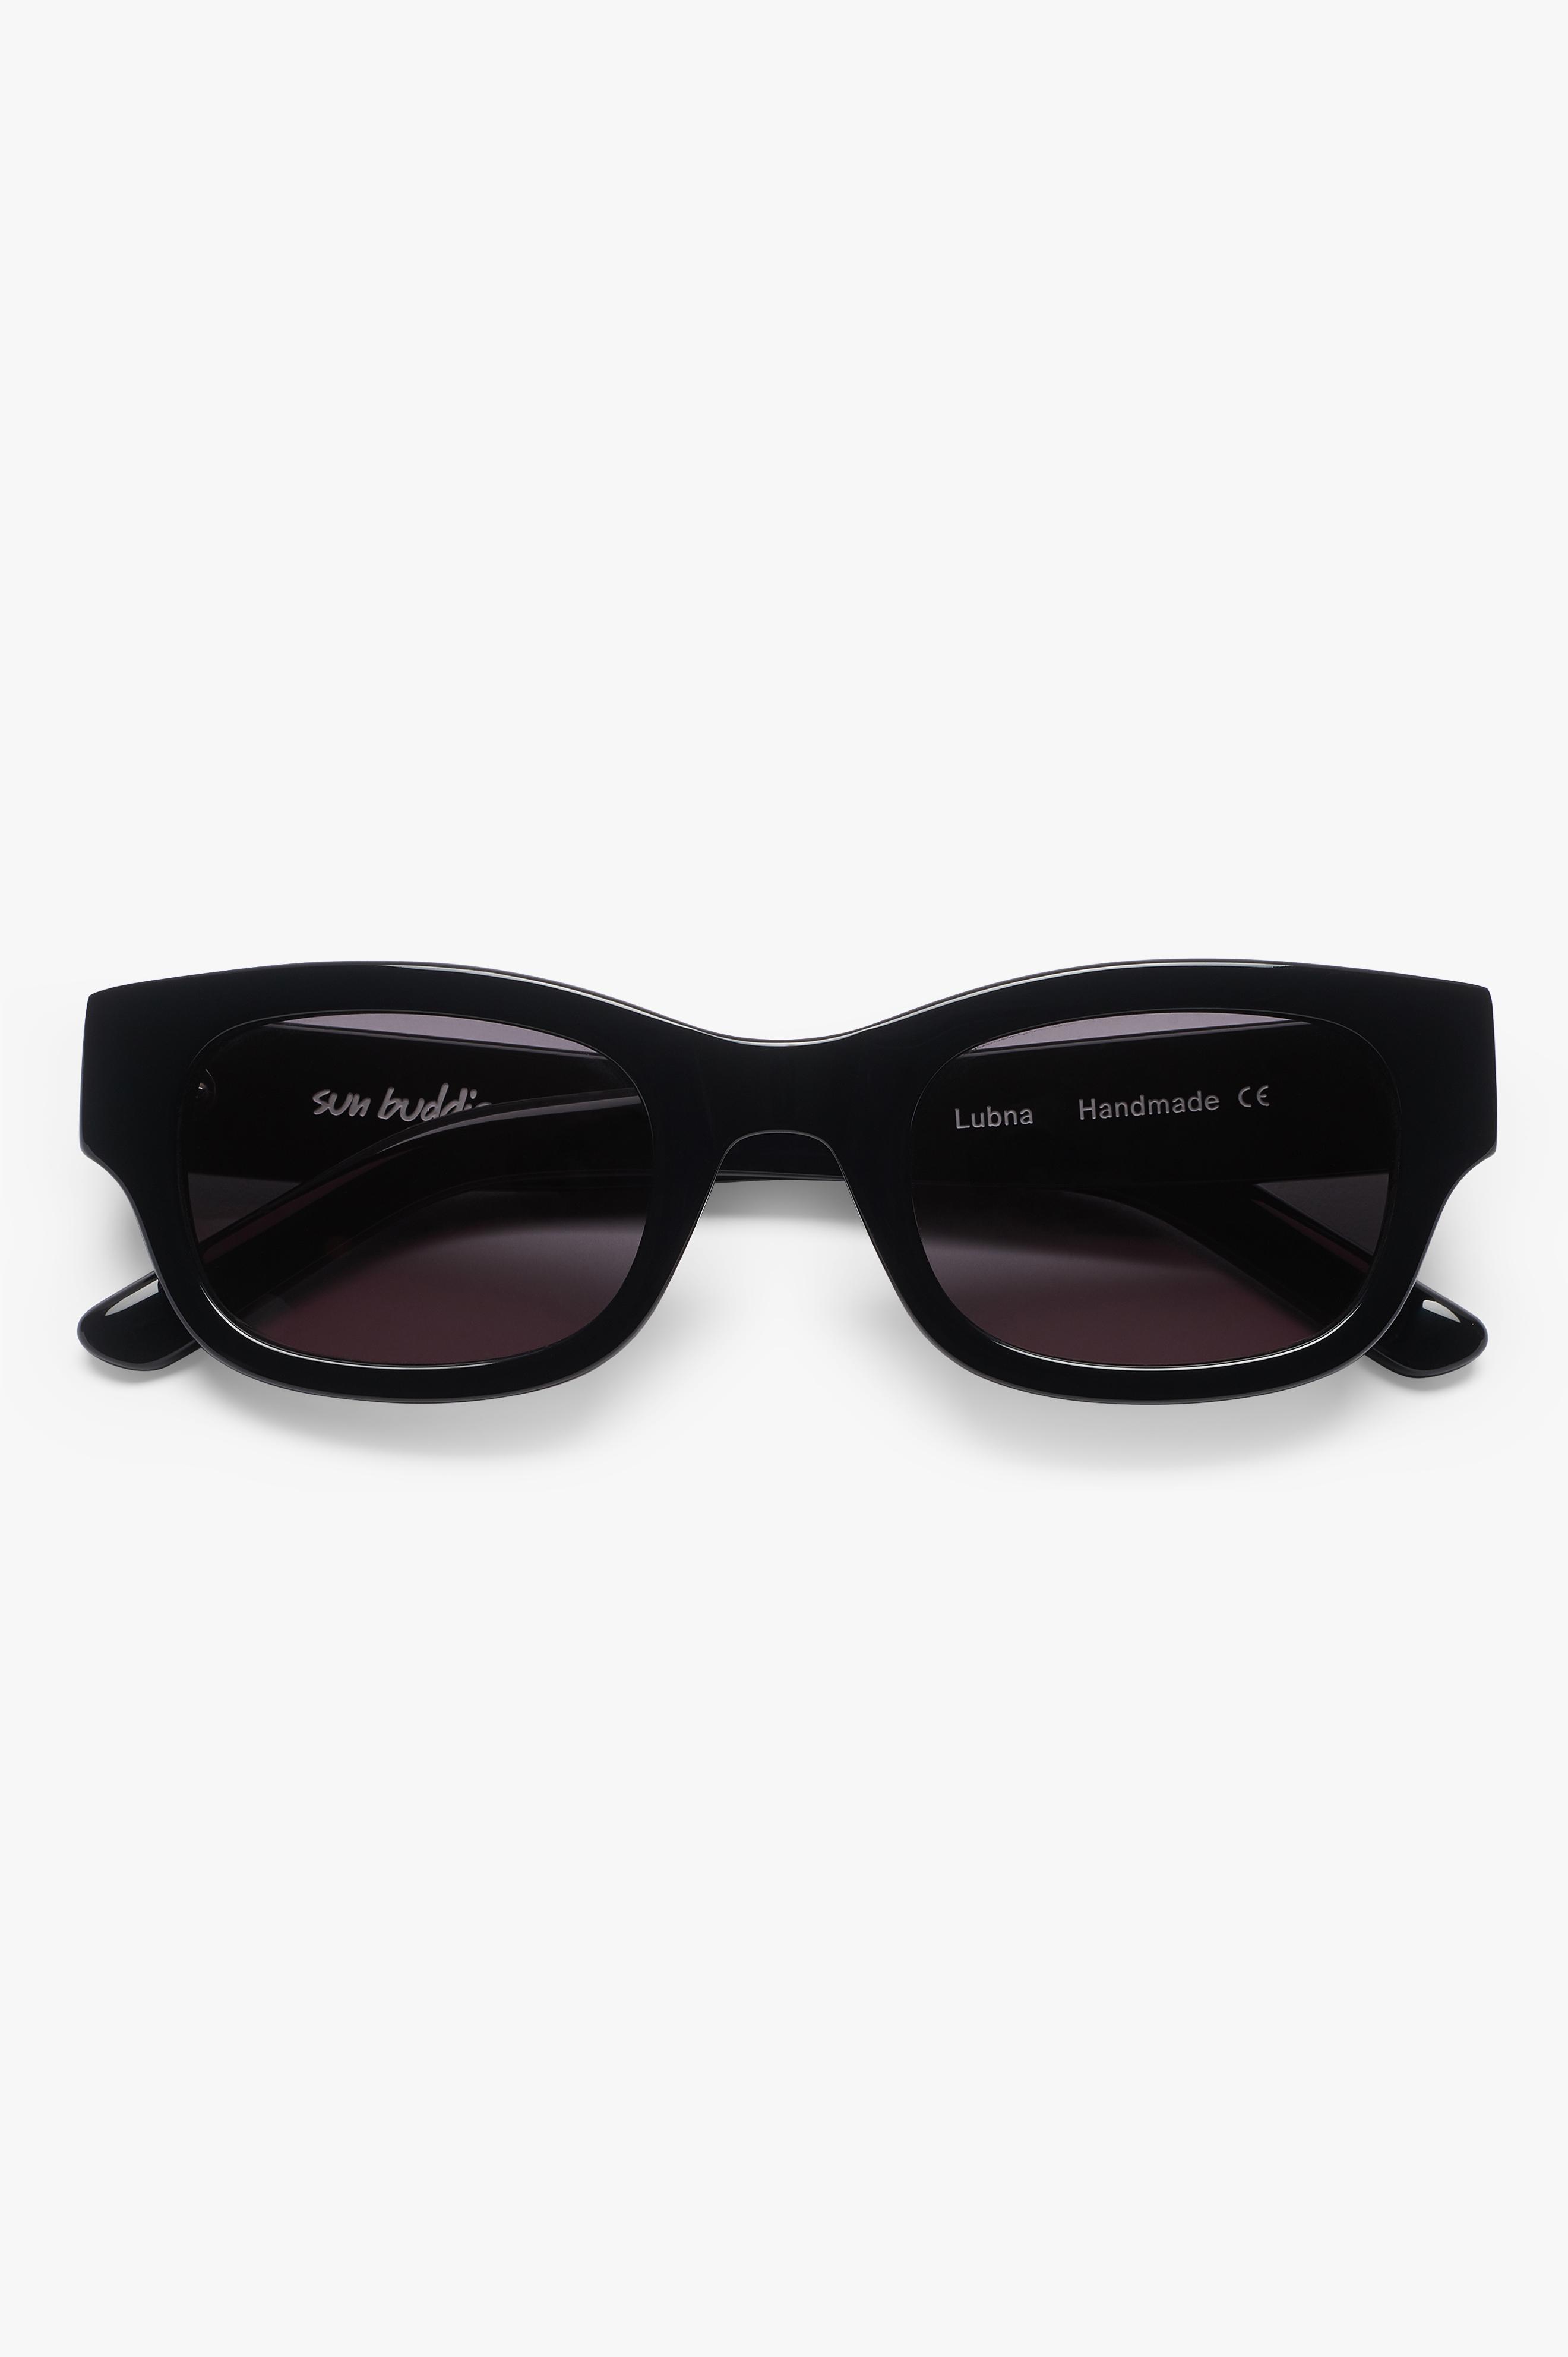 Lubna Sunglasses Black